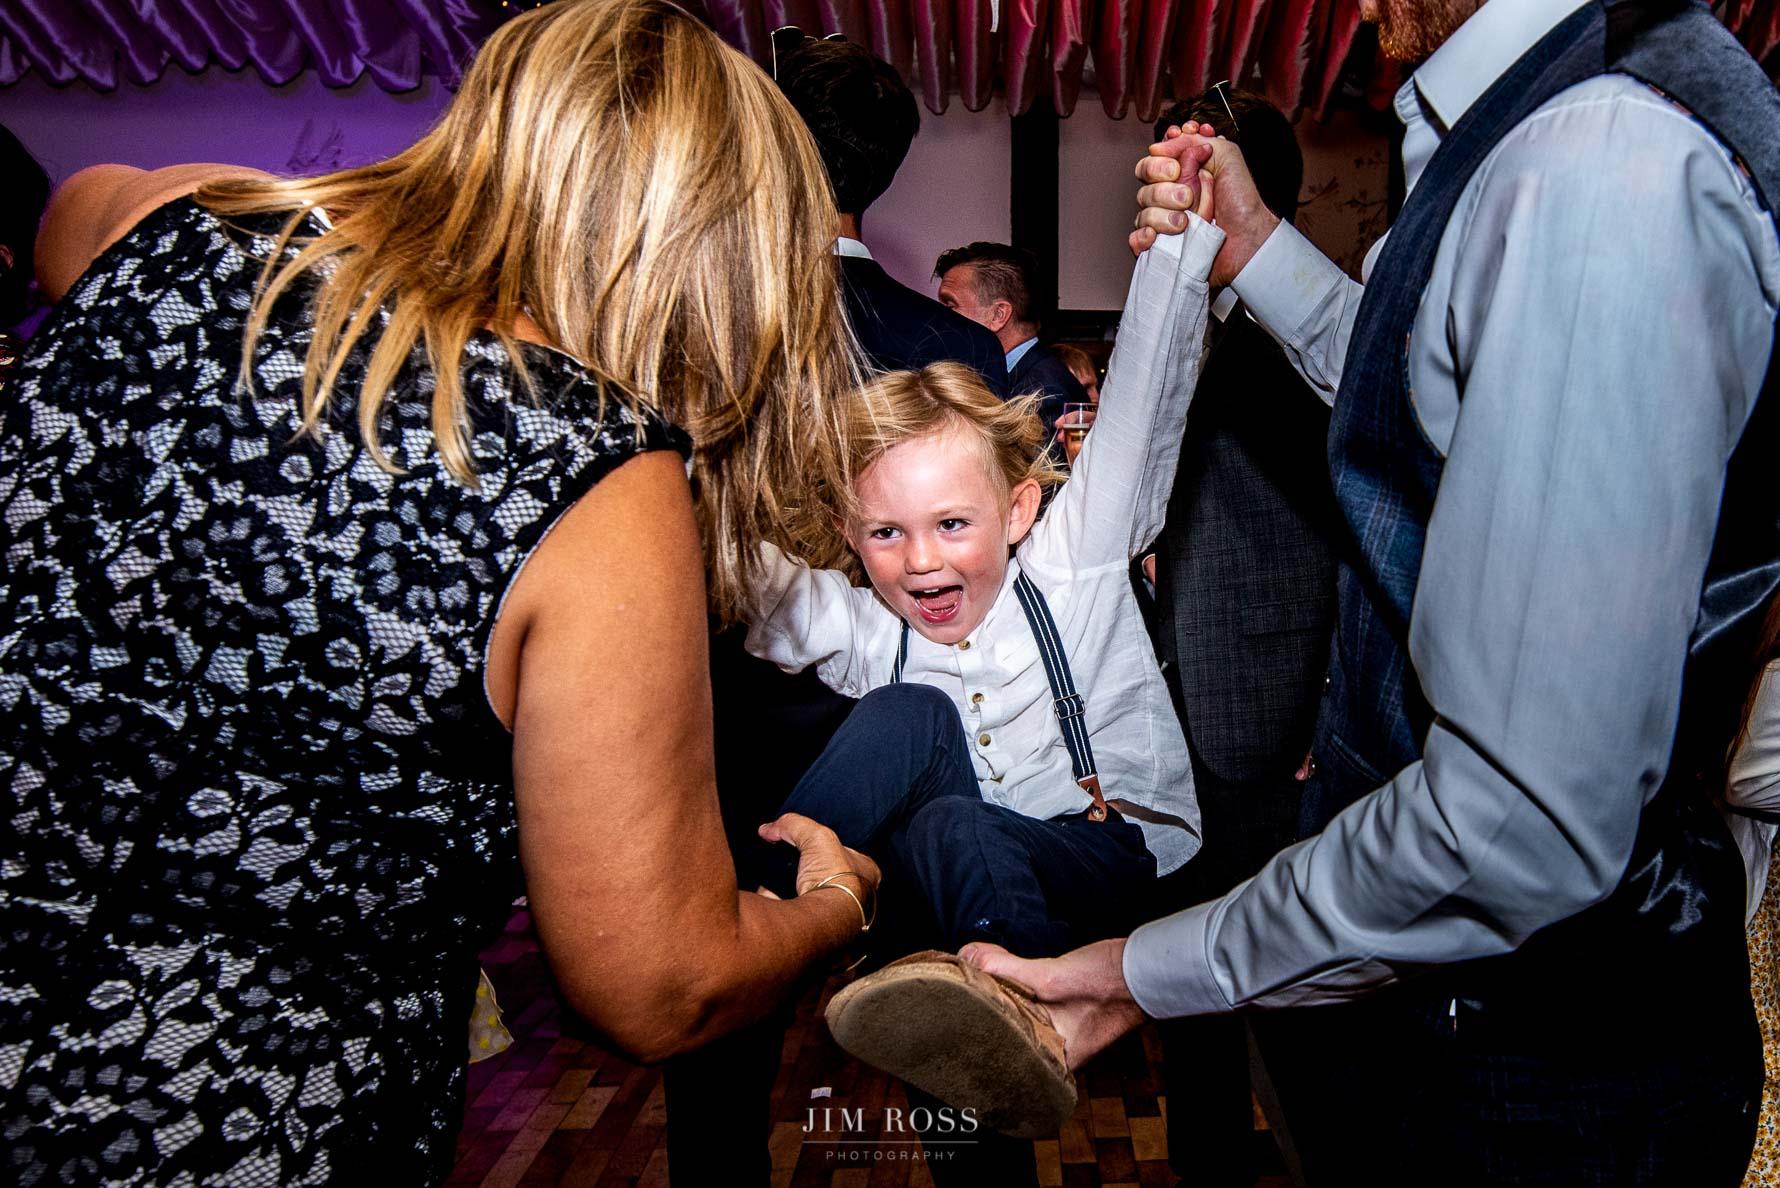 Child on the dance floor